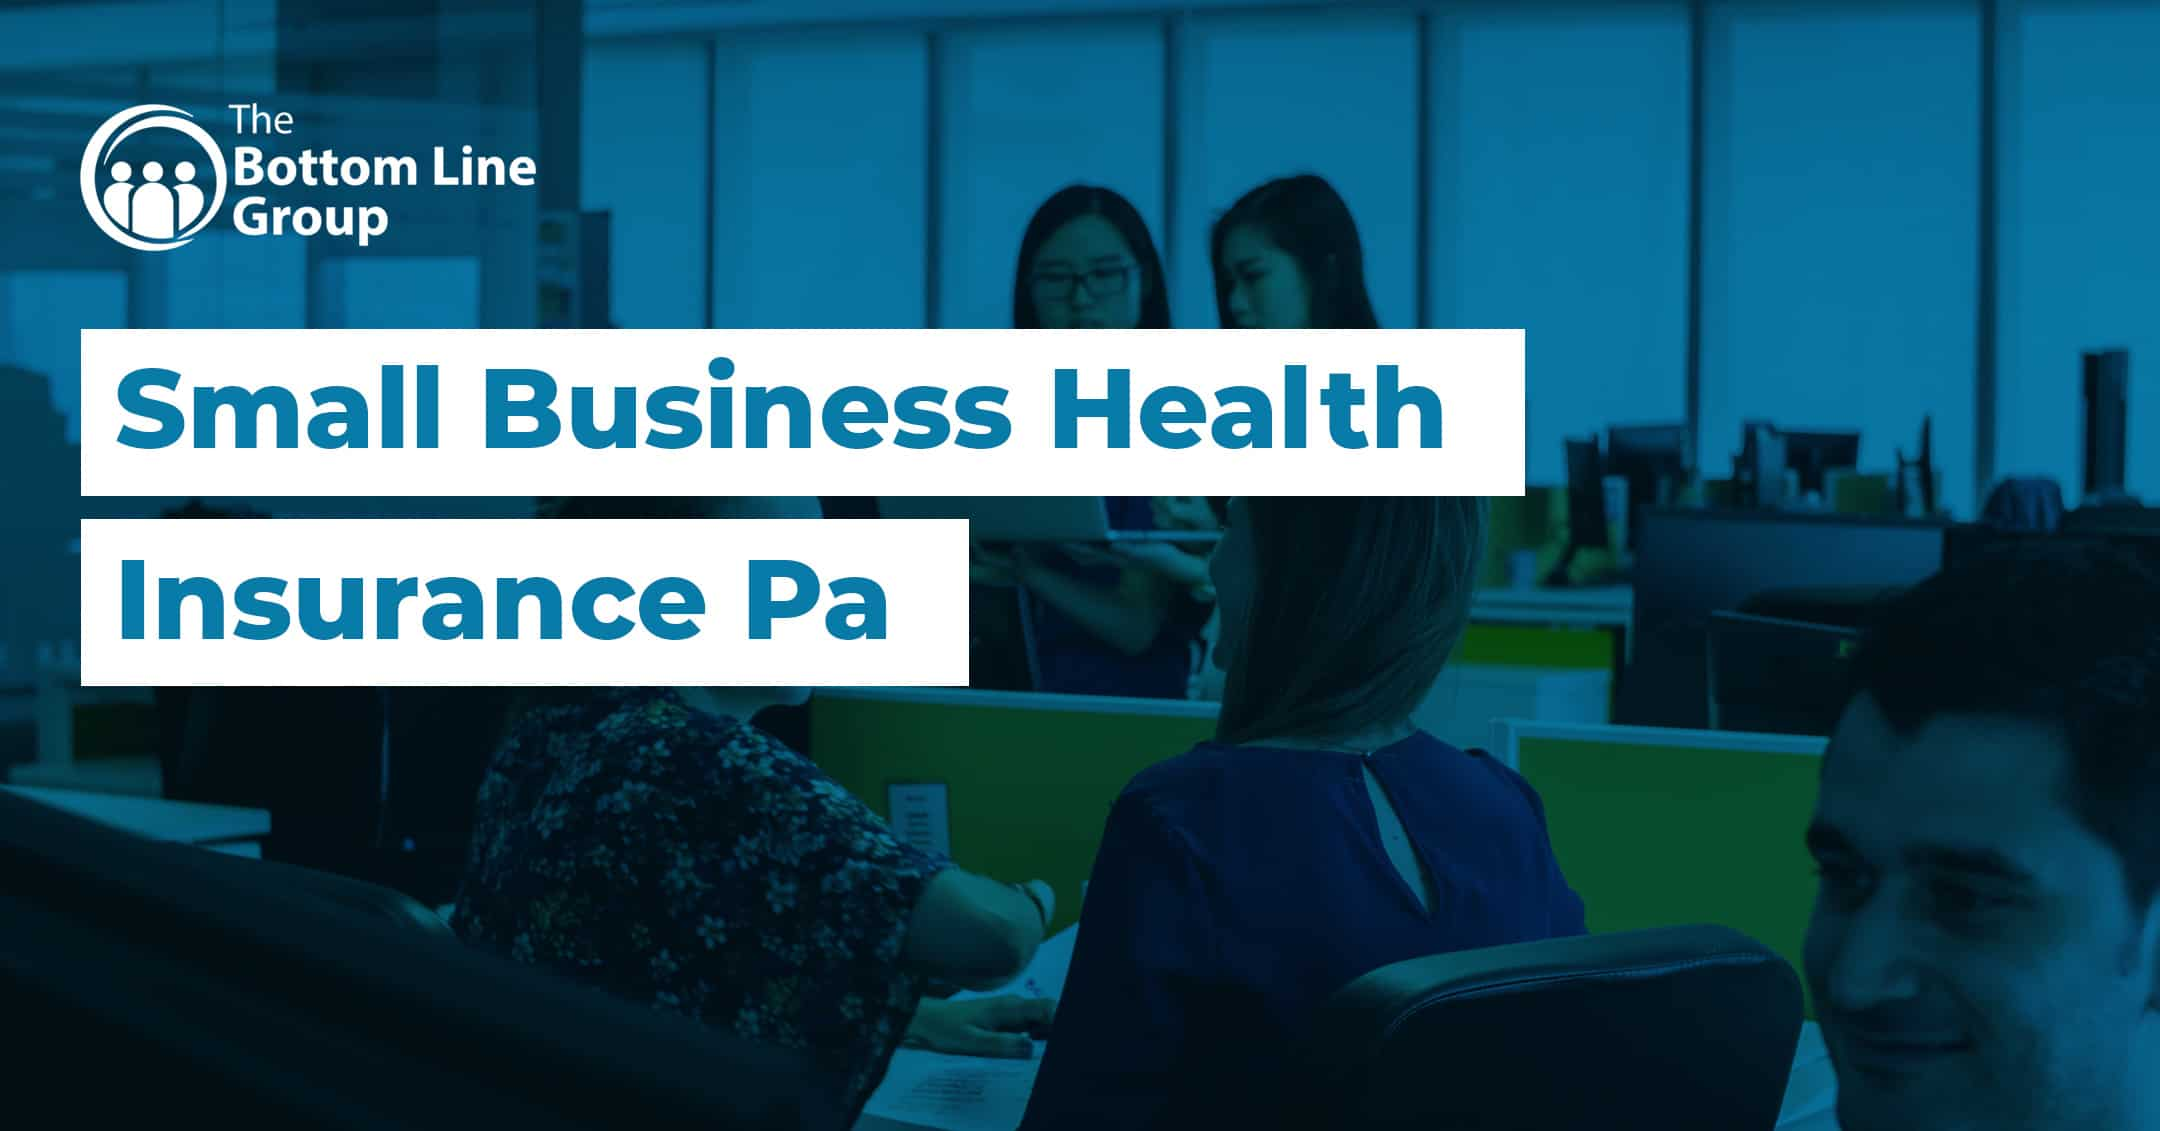 56-(Small-Business-Health-Insurance-Pa)1